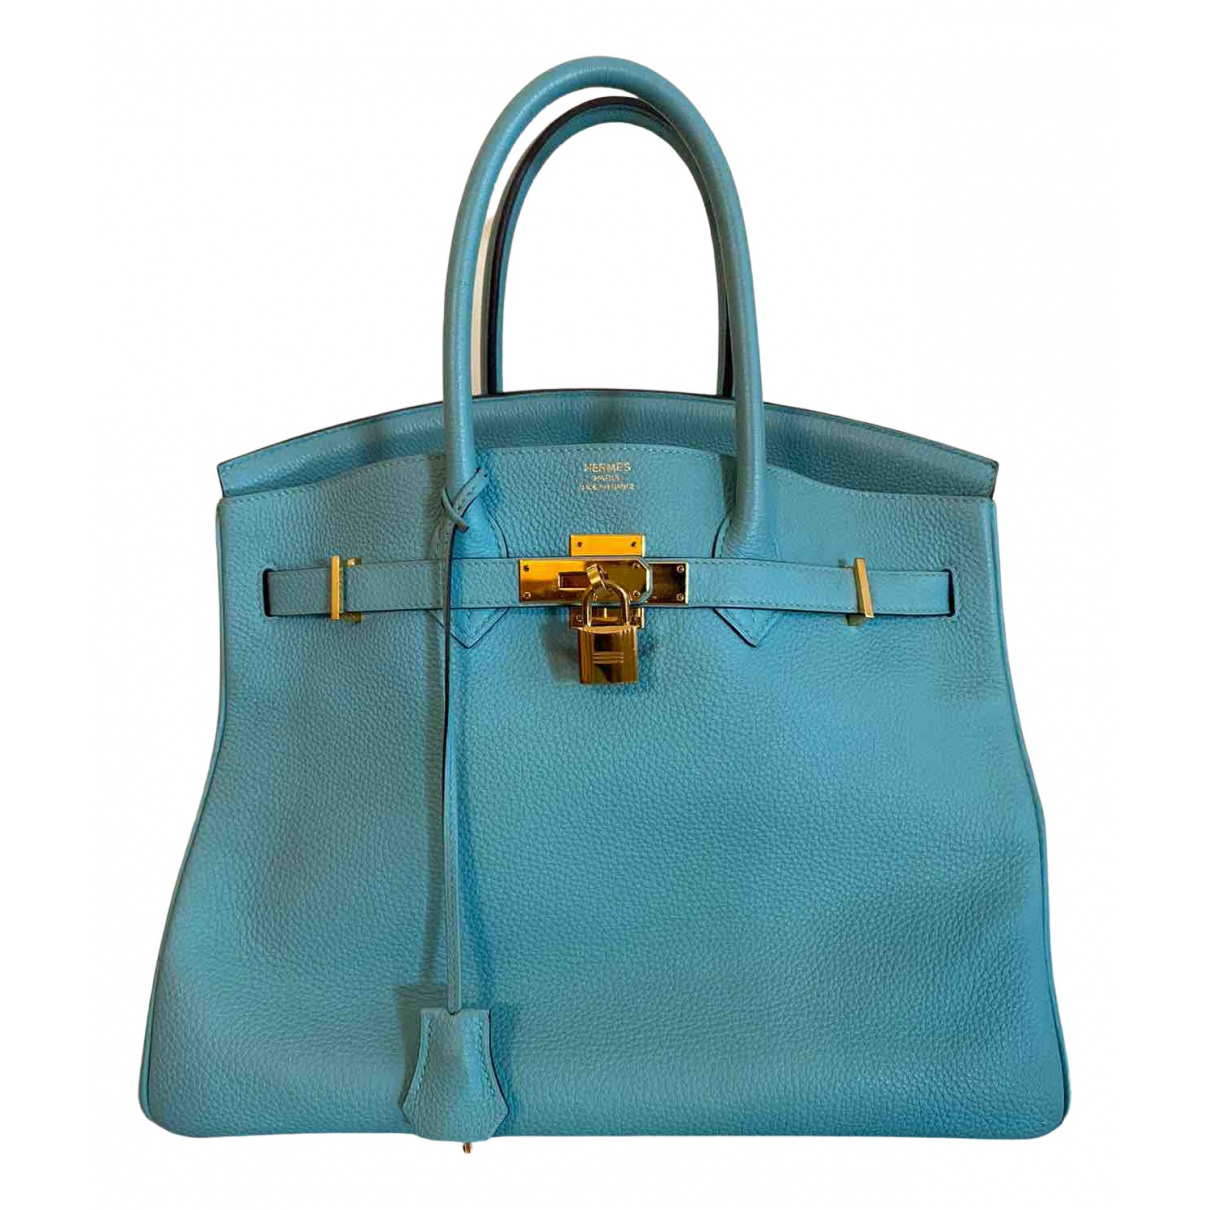 Hermès Birkin 35 Turquoise Leather handbag for Women N